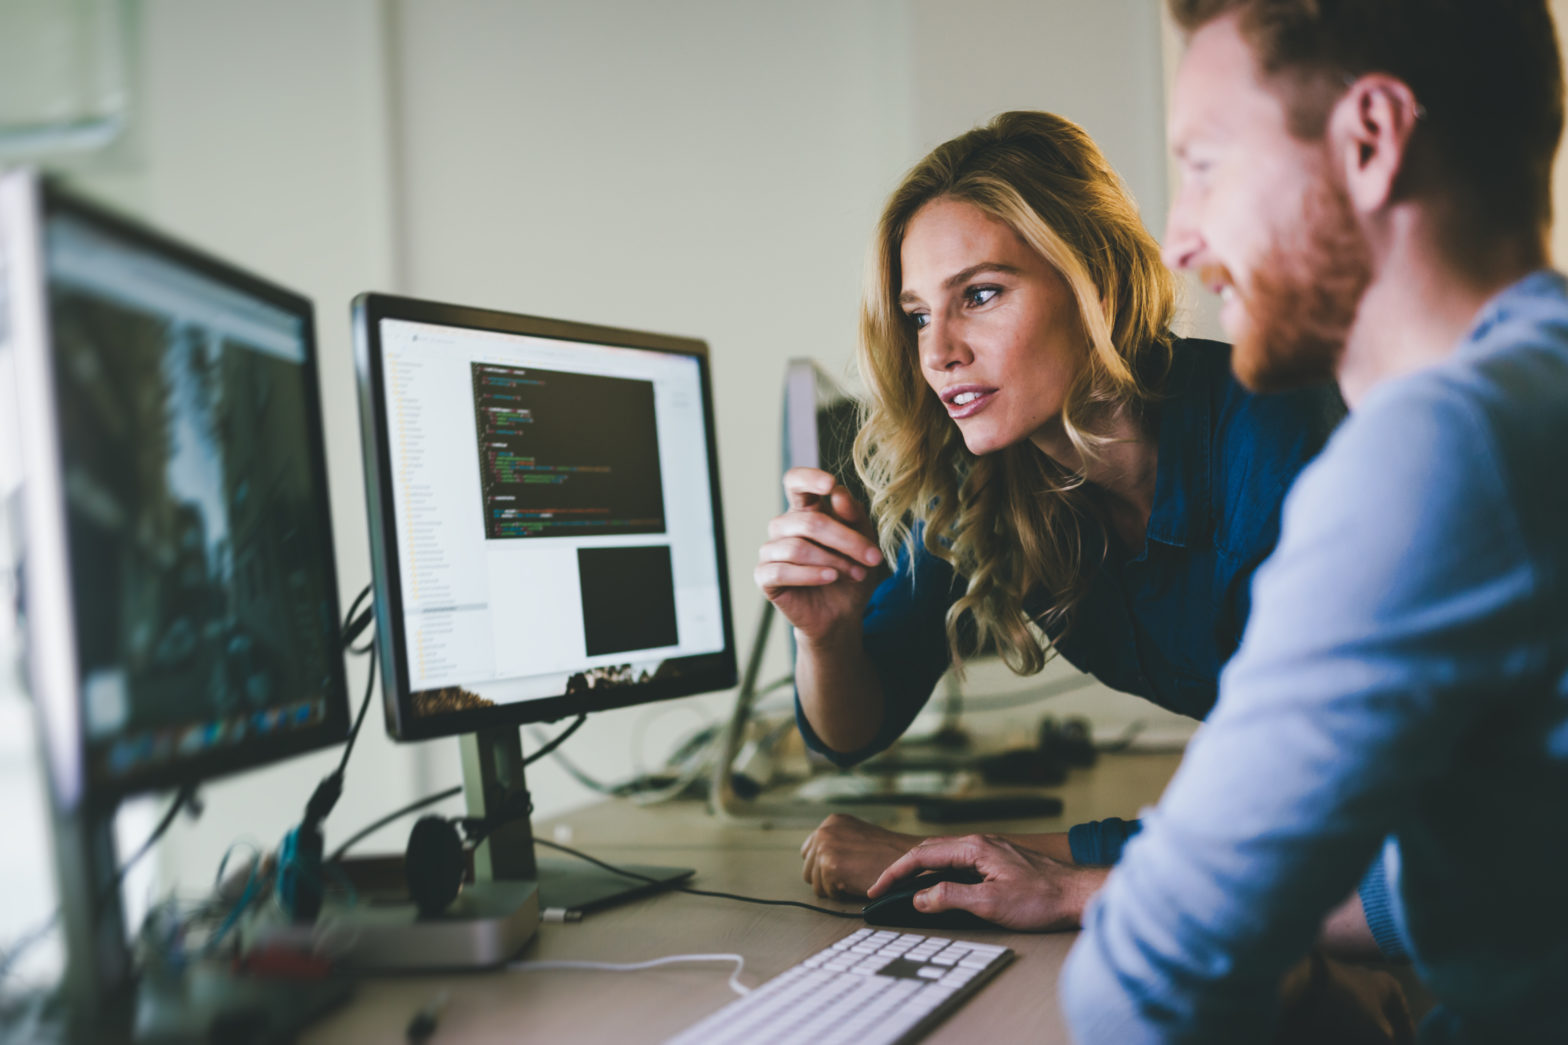 Bureau Veritas cybersecurity certification for IoT devices